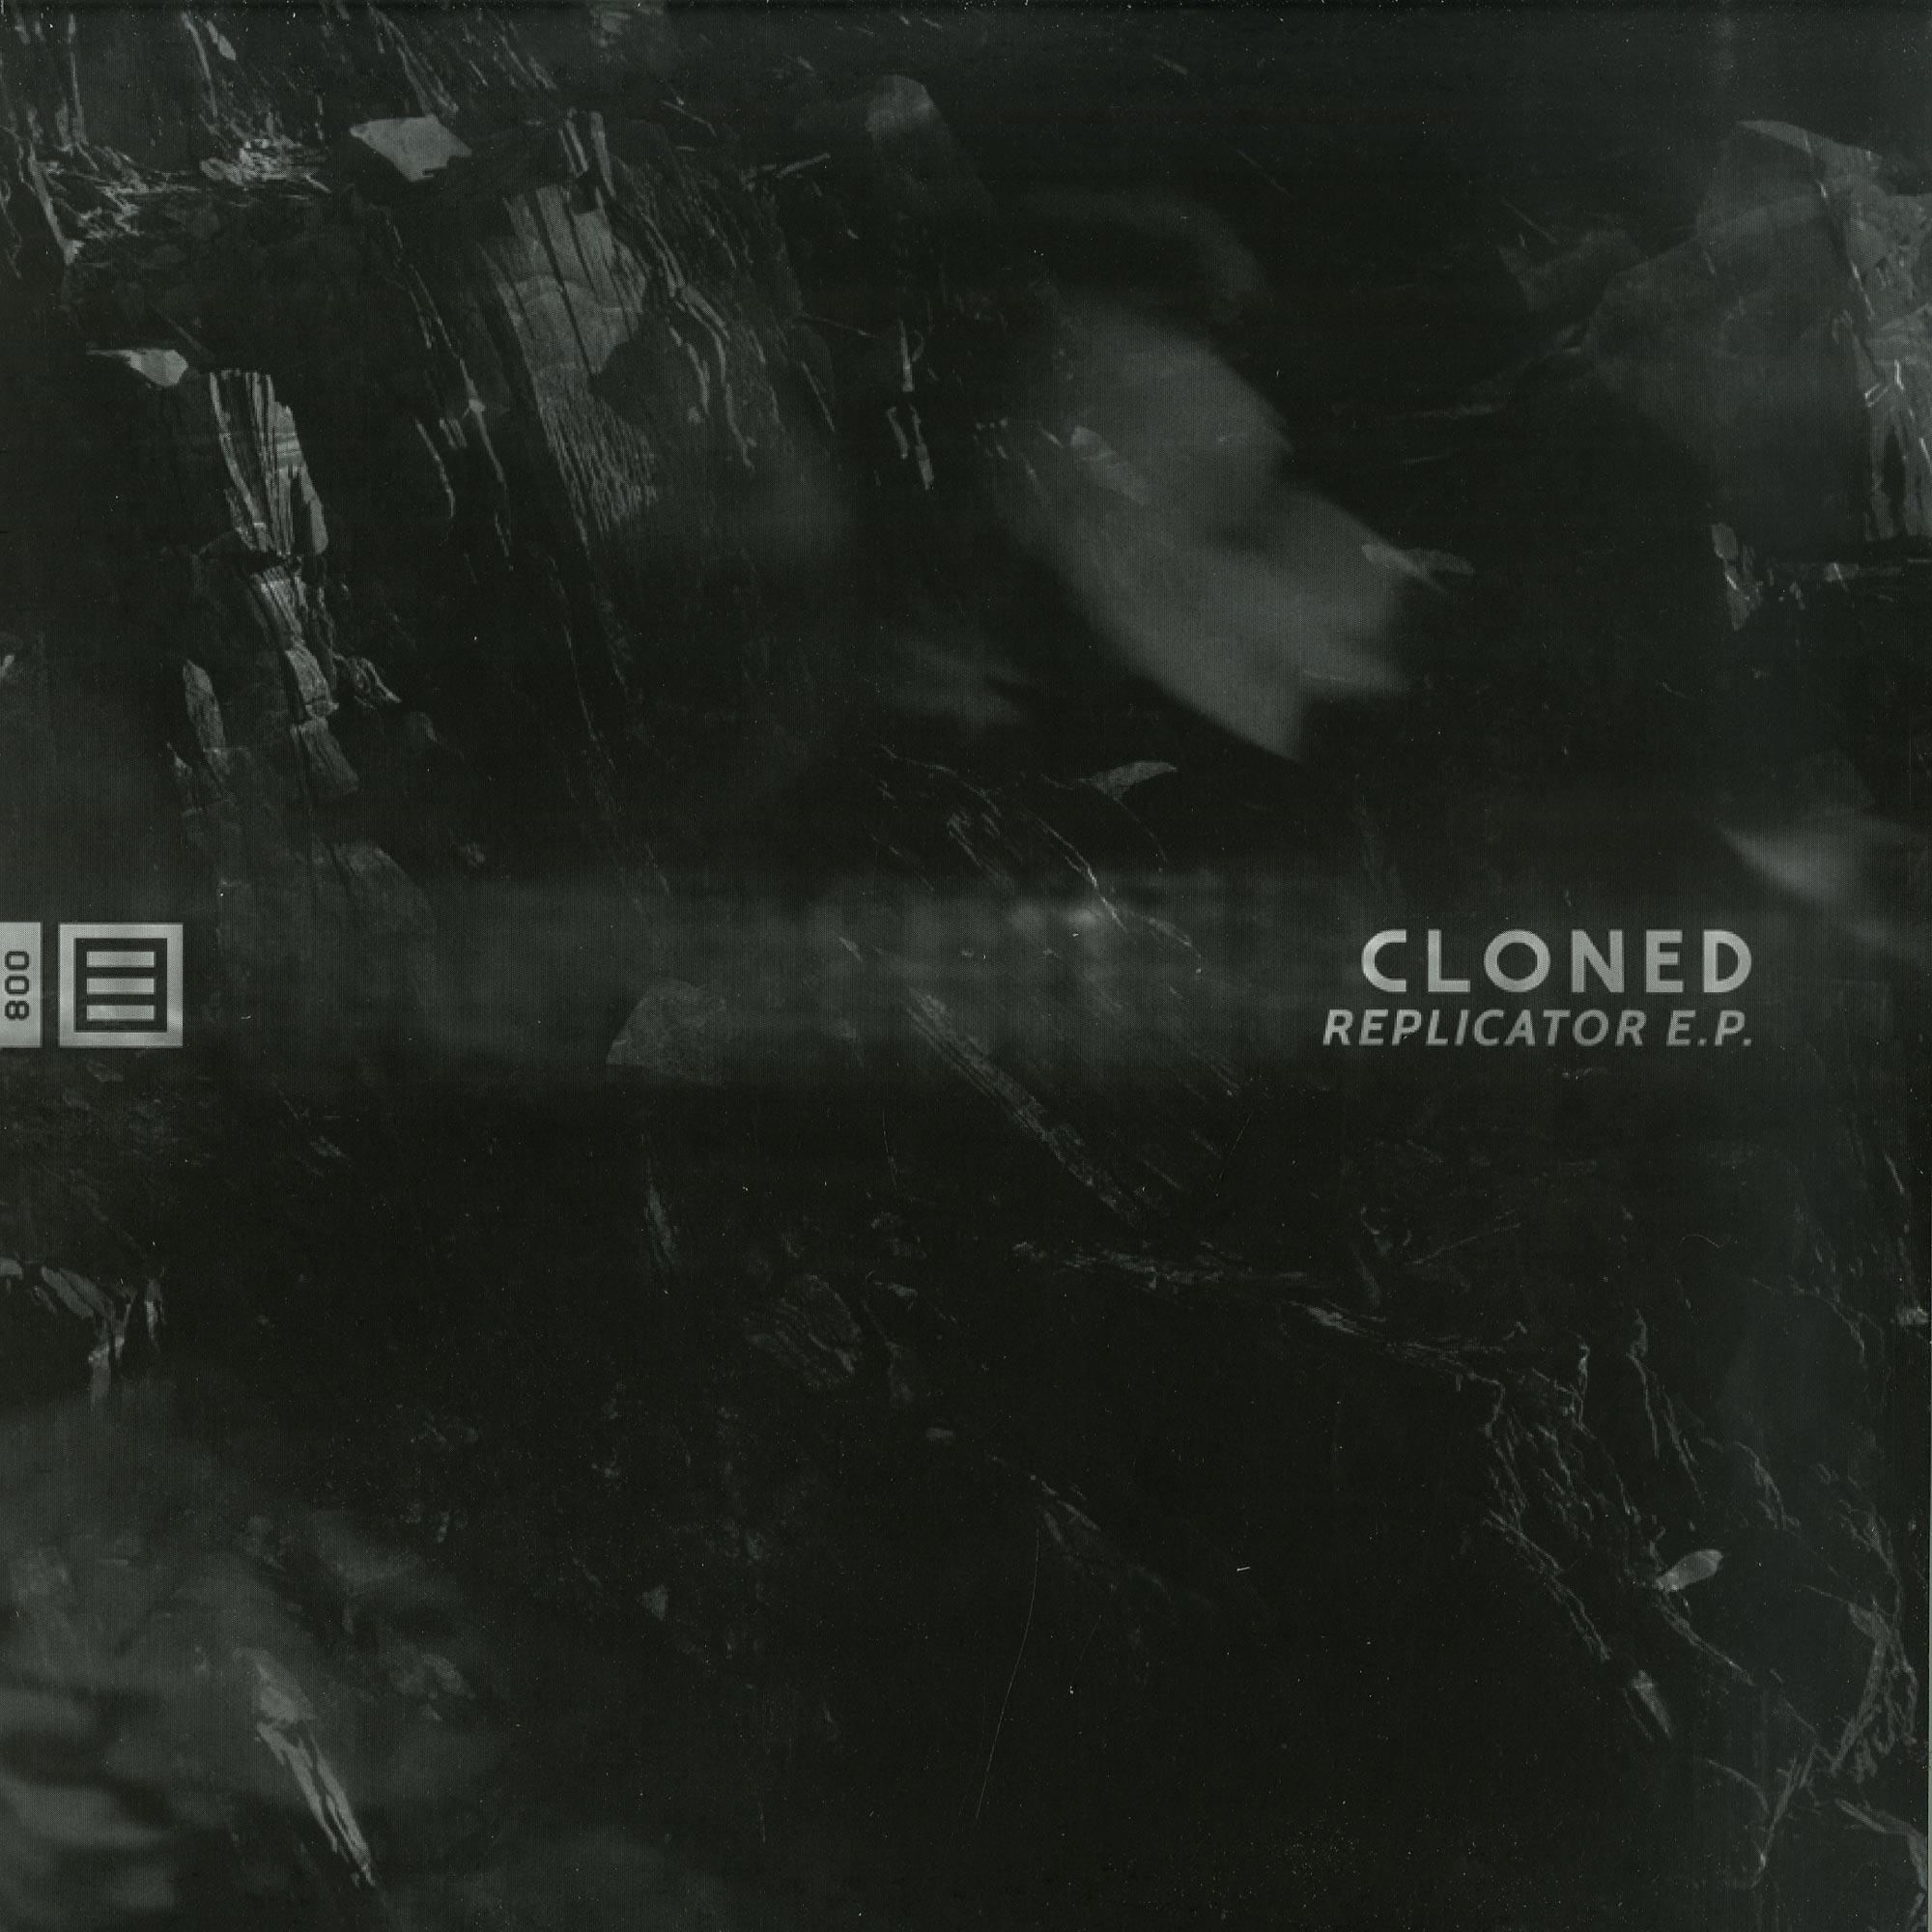 Cloned - REPLICATOR EP